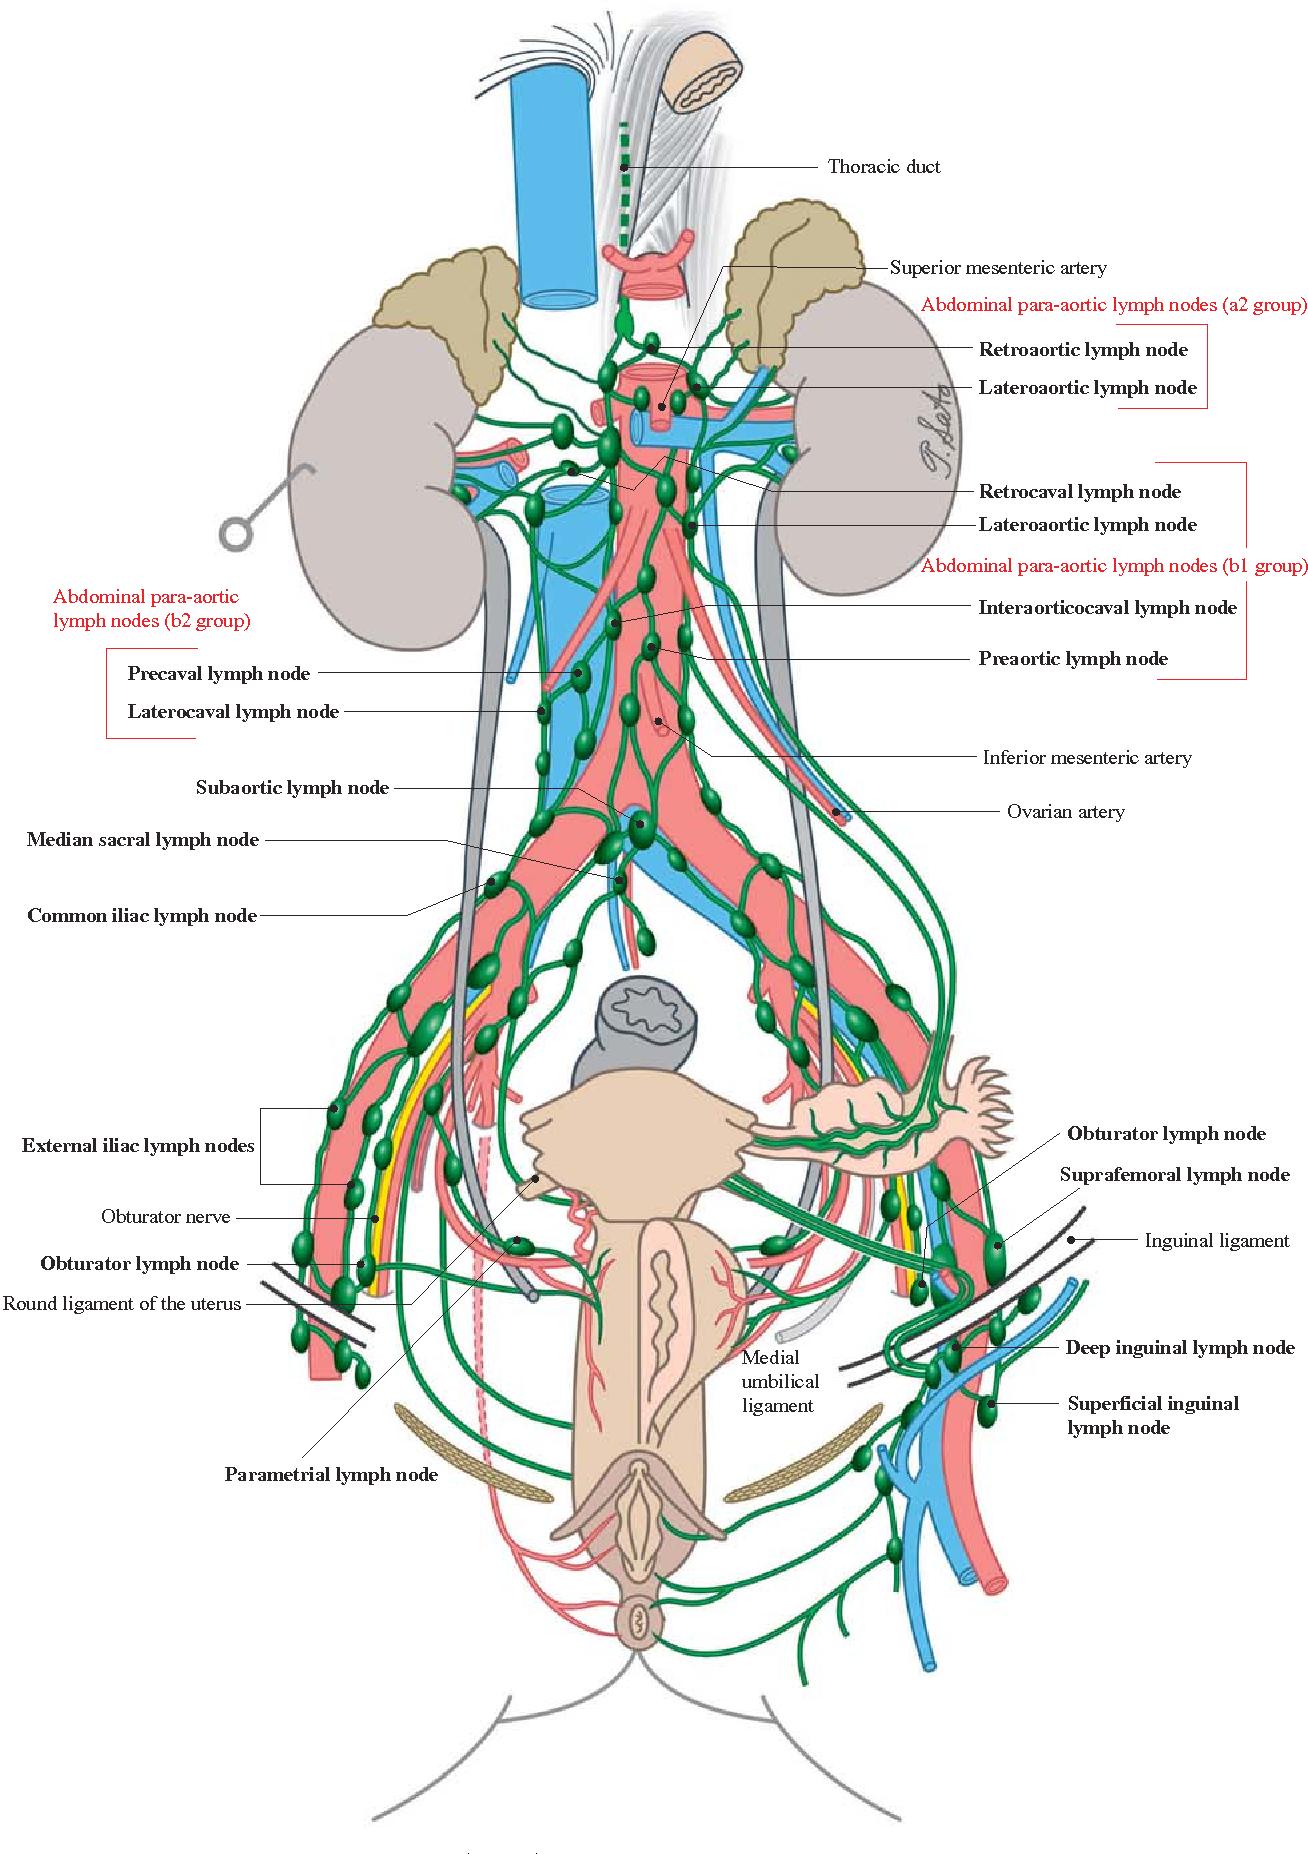 Classification Of Regional Lymph Nodes In Japan Semantic Scholar